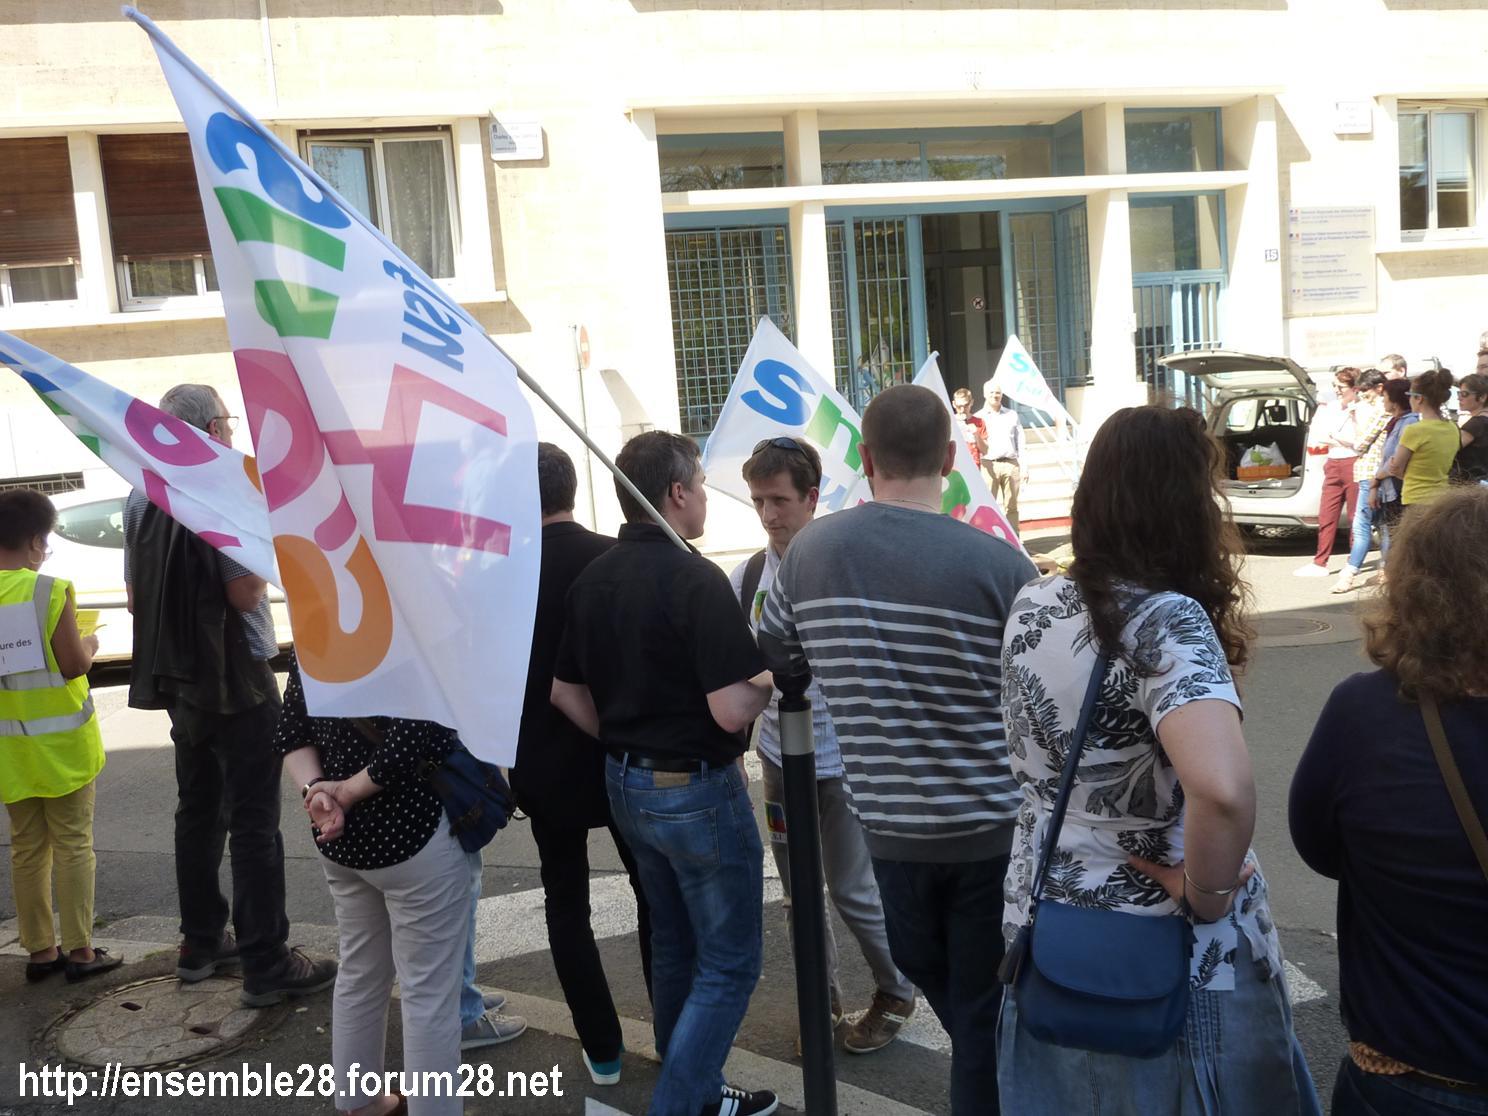 19-04-2018 Chartres Manifestation Interprofessionnelle CGT Solidaires SNES-FSU n°01